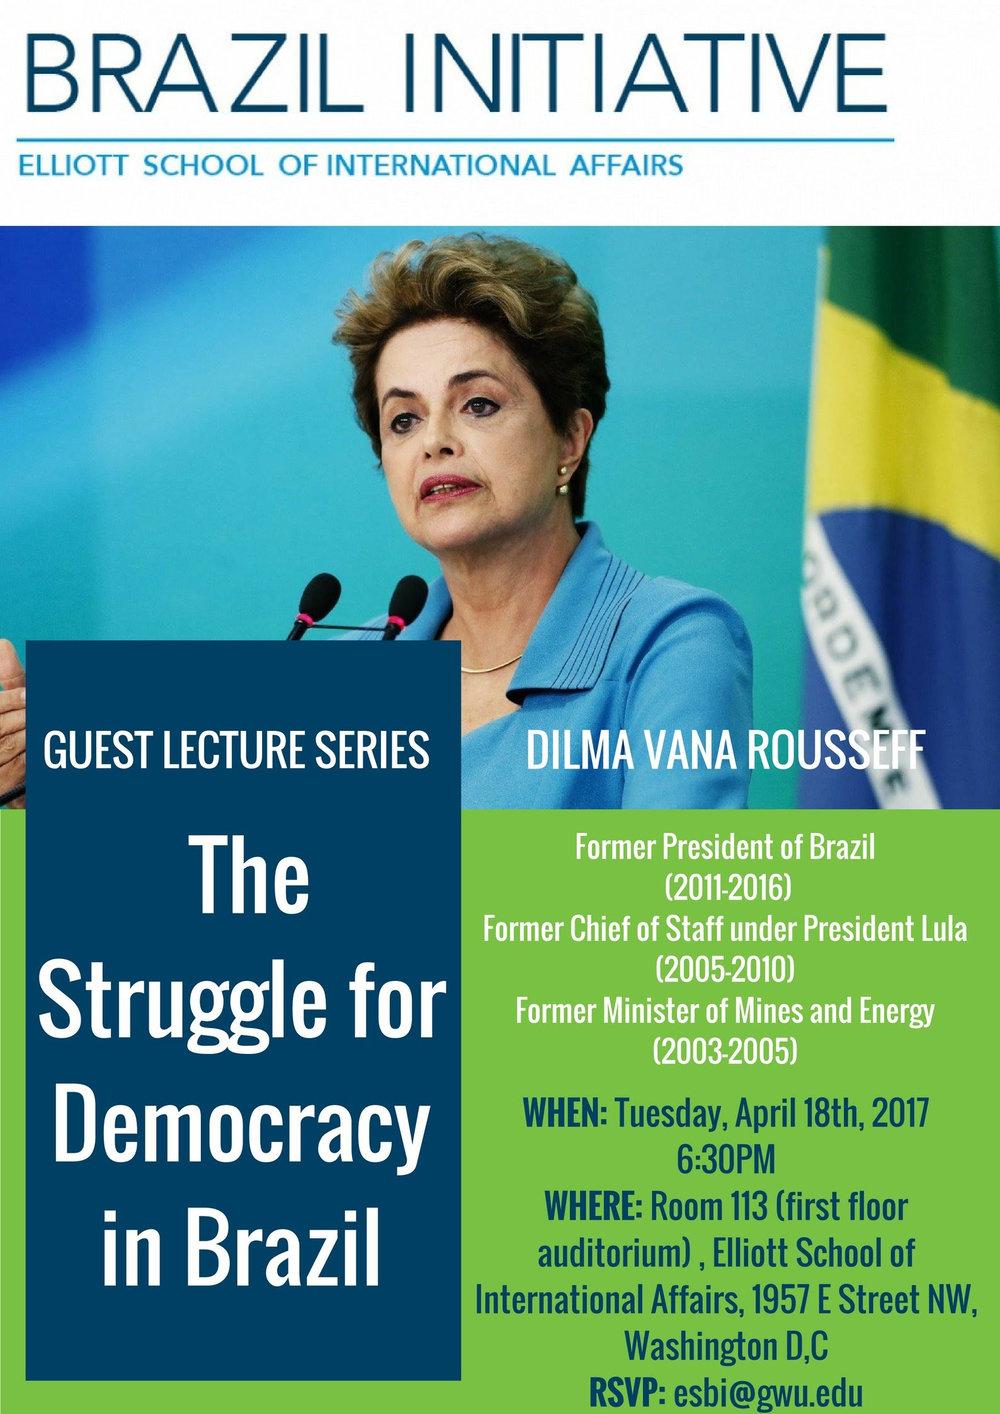 Dilma April 18 at GWU.jpg